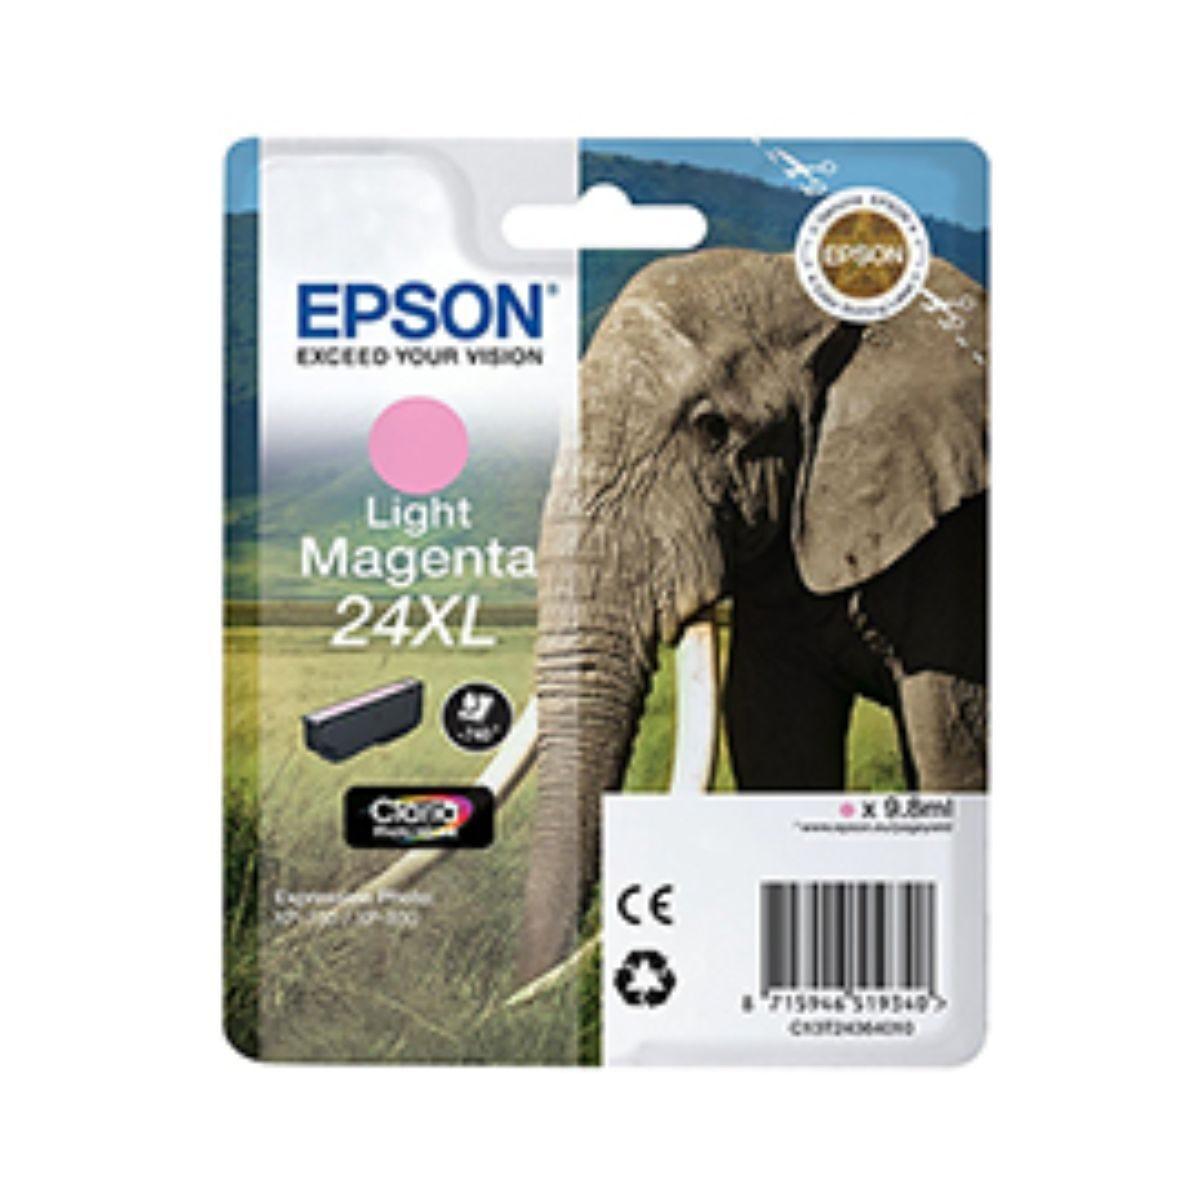 Epson T2436 24XL Ink Cartridge Light Magenta